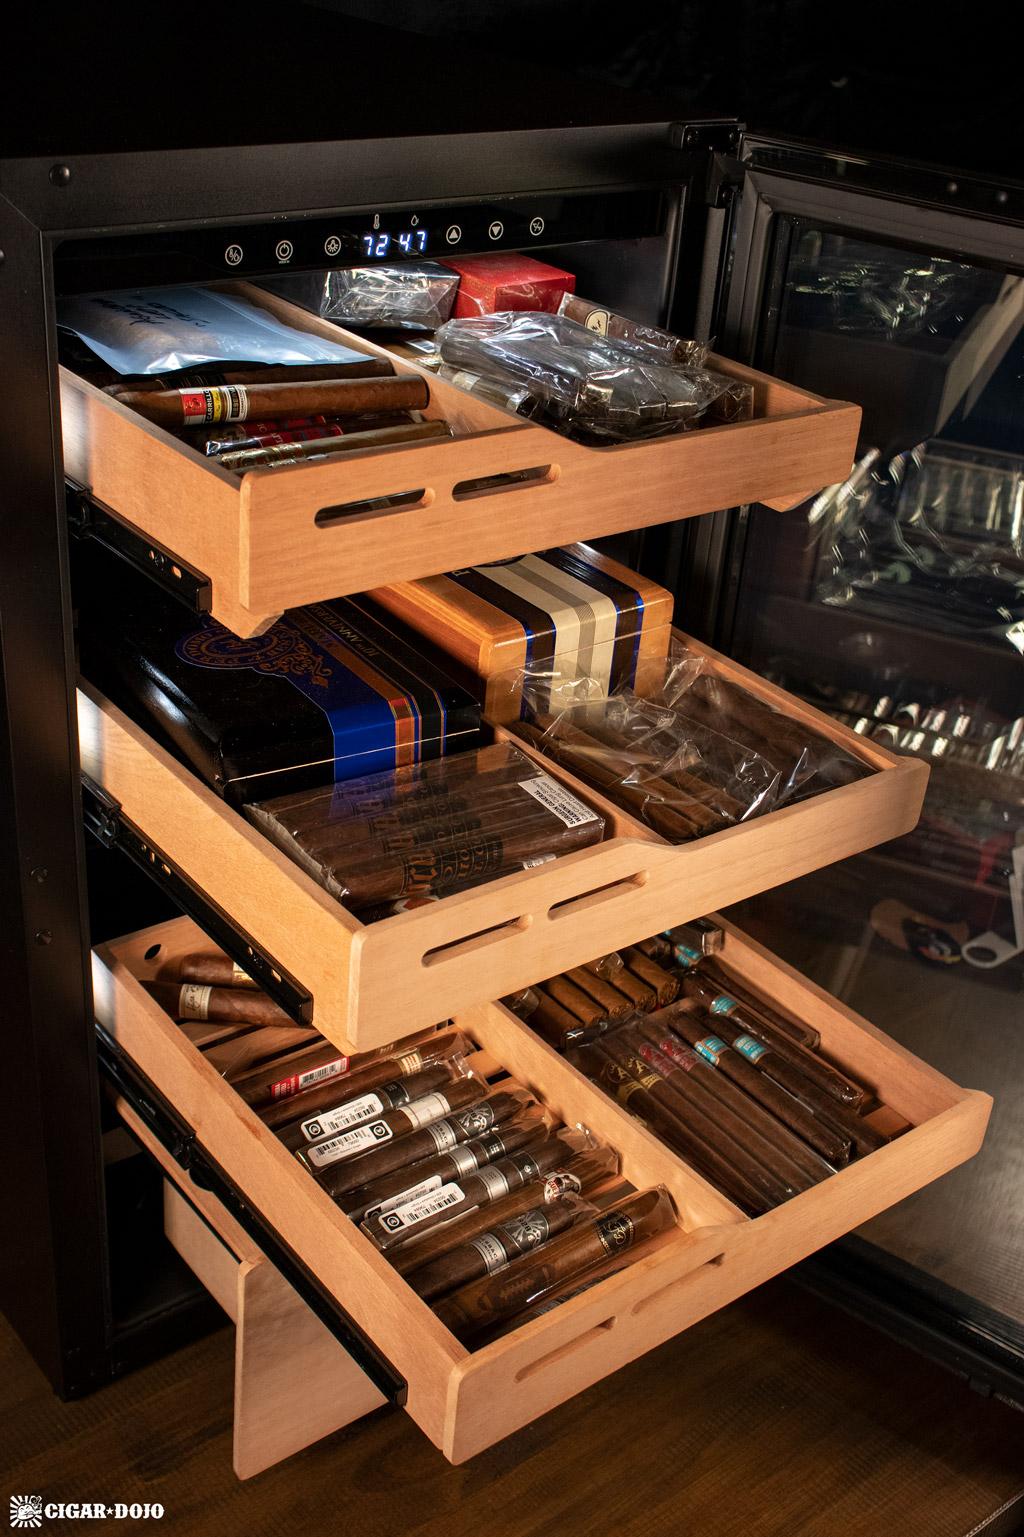 NewAir NCH840BK00 840 Count Humidor cedar shelves full